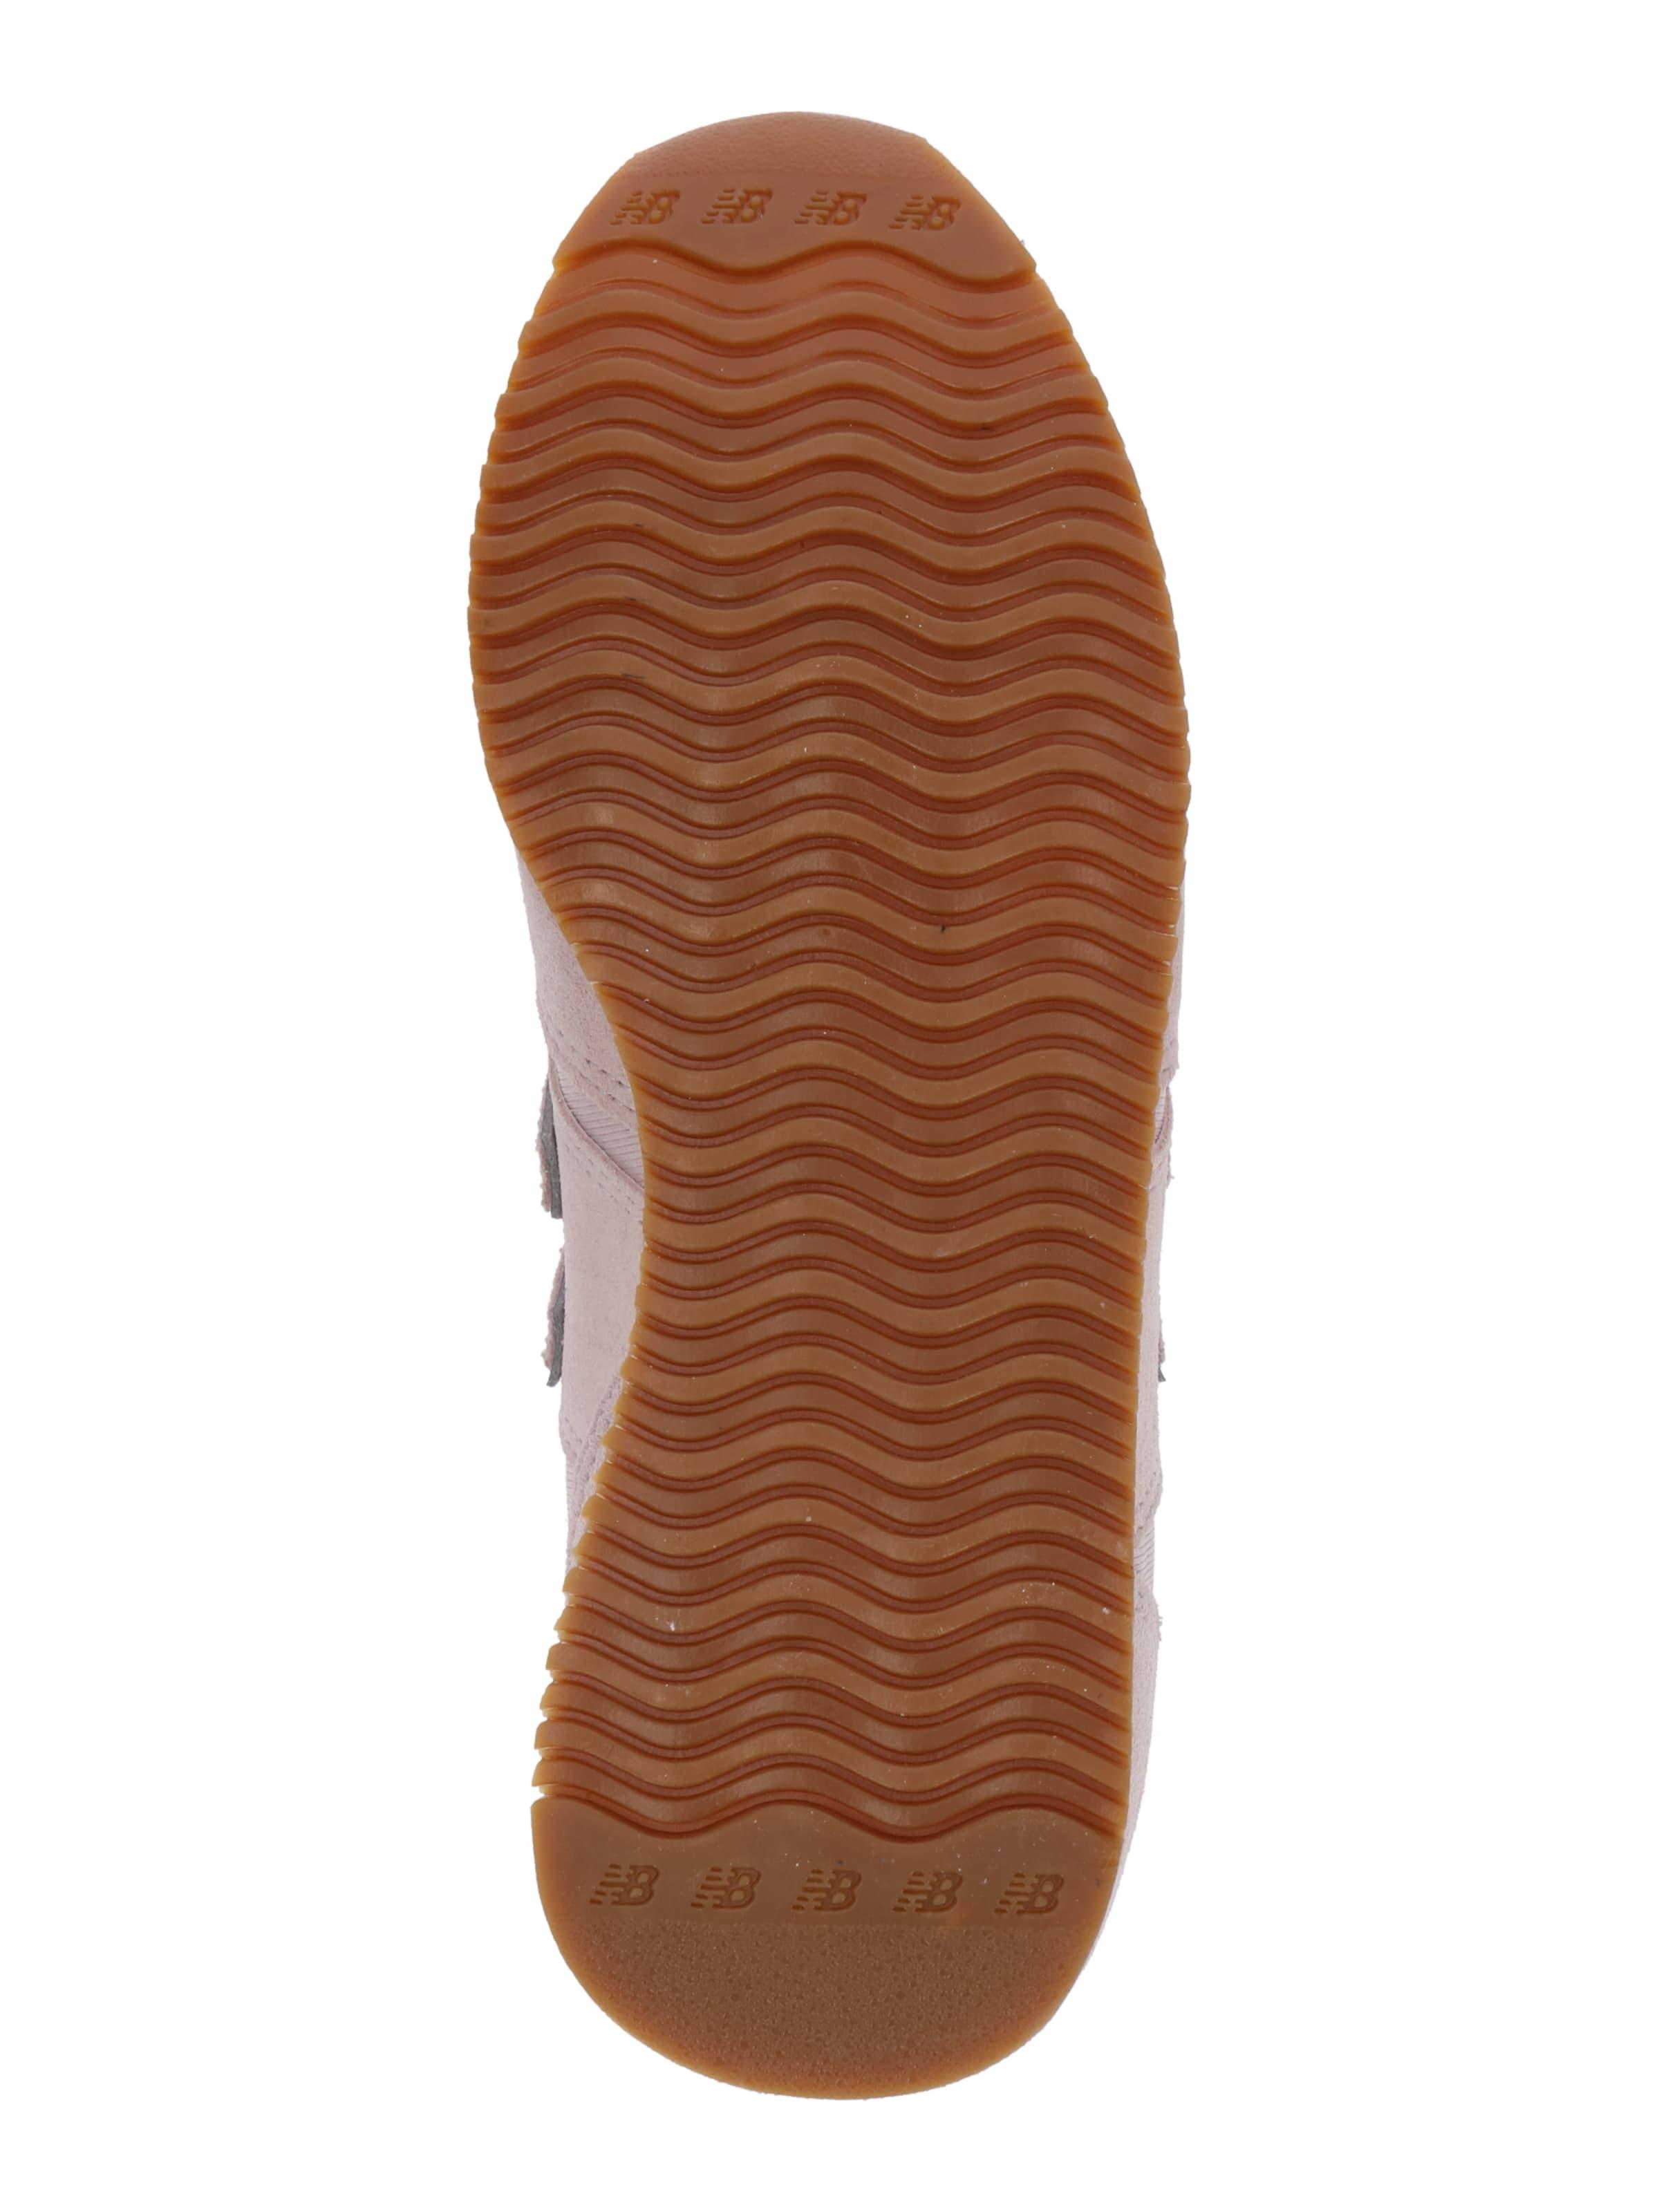 In Balance Sneaker New Rosa 'wl420gpg' c5uTJ31KlF